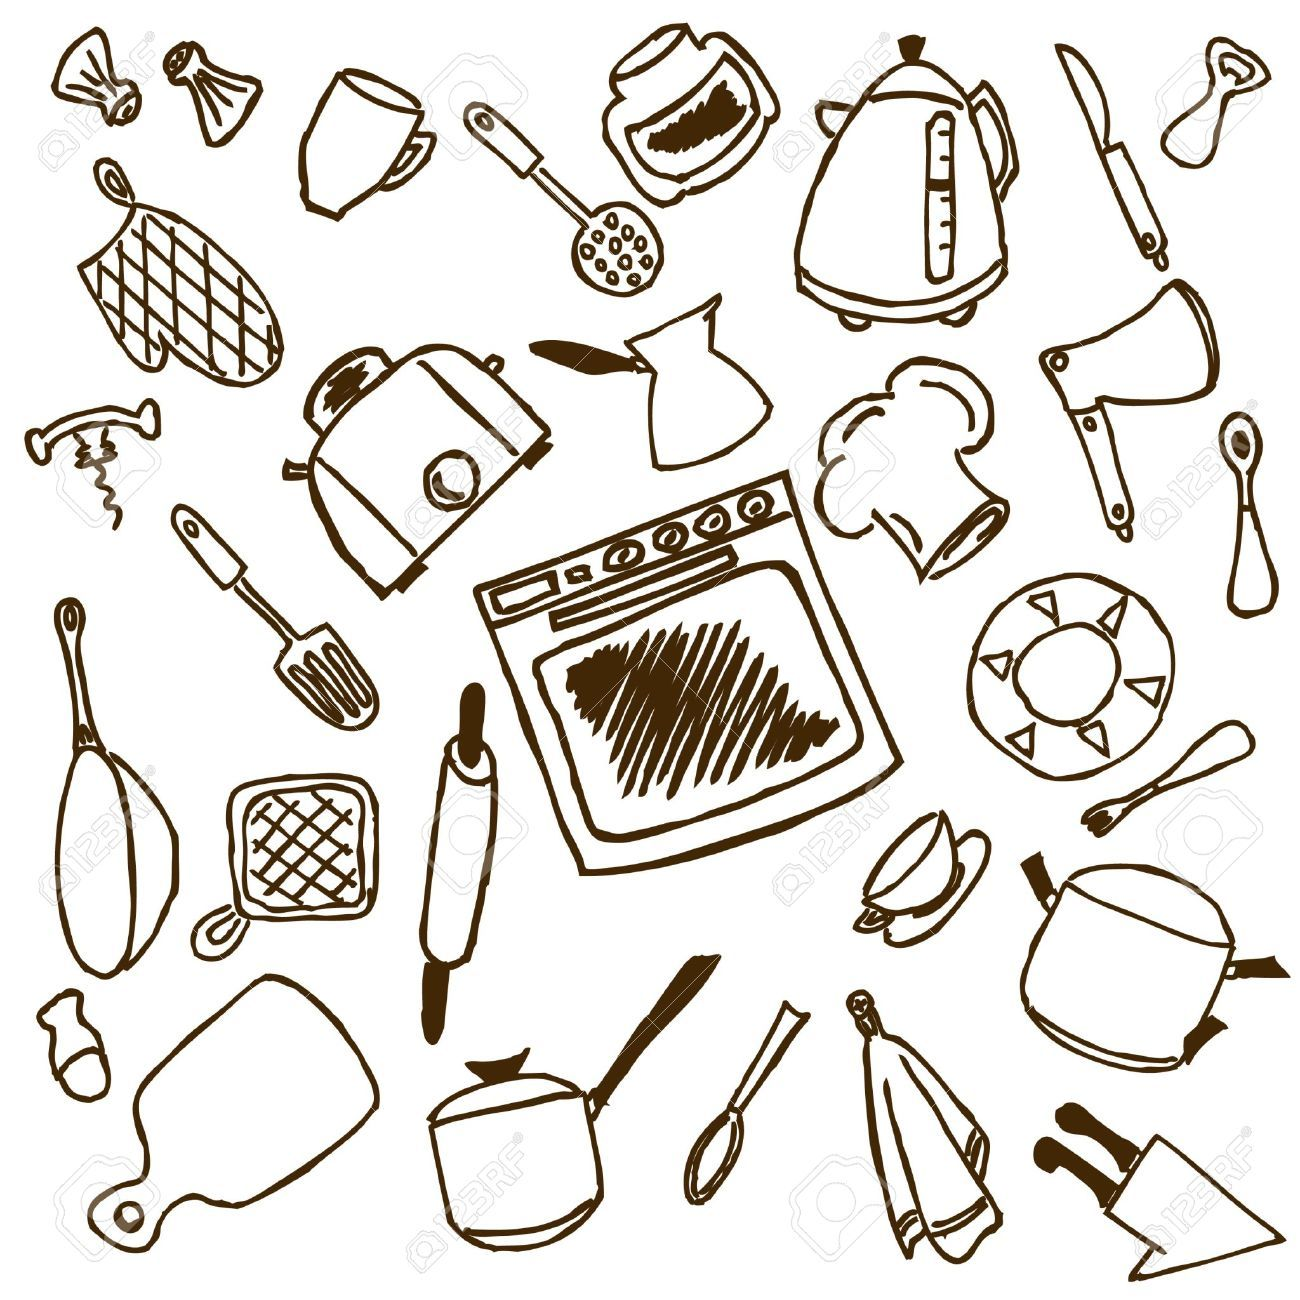 Risultati immagini per utensili cucina disegni   Utensili cucina ...